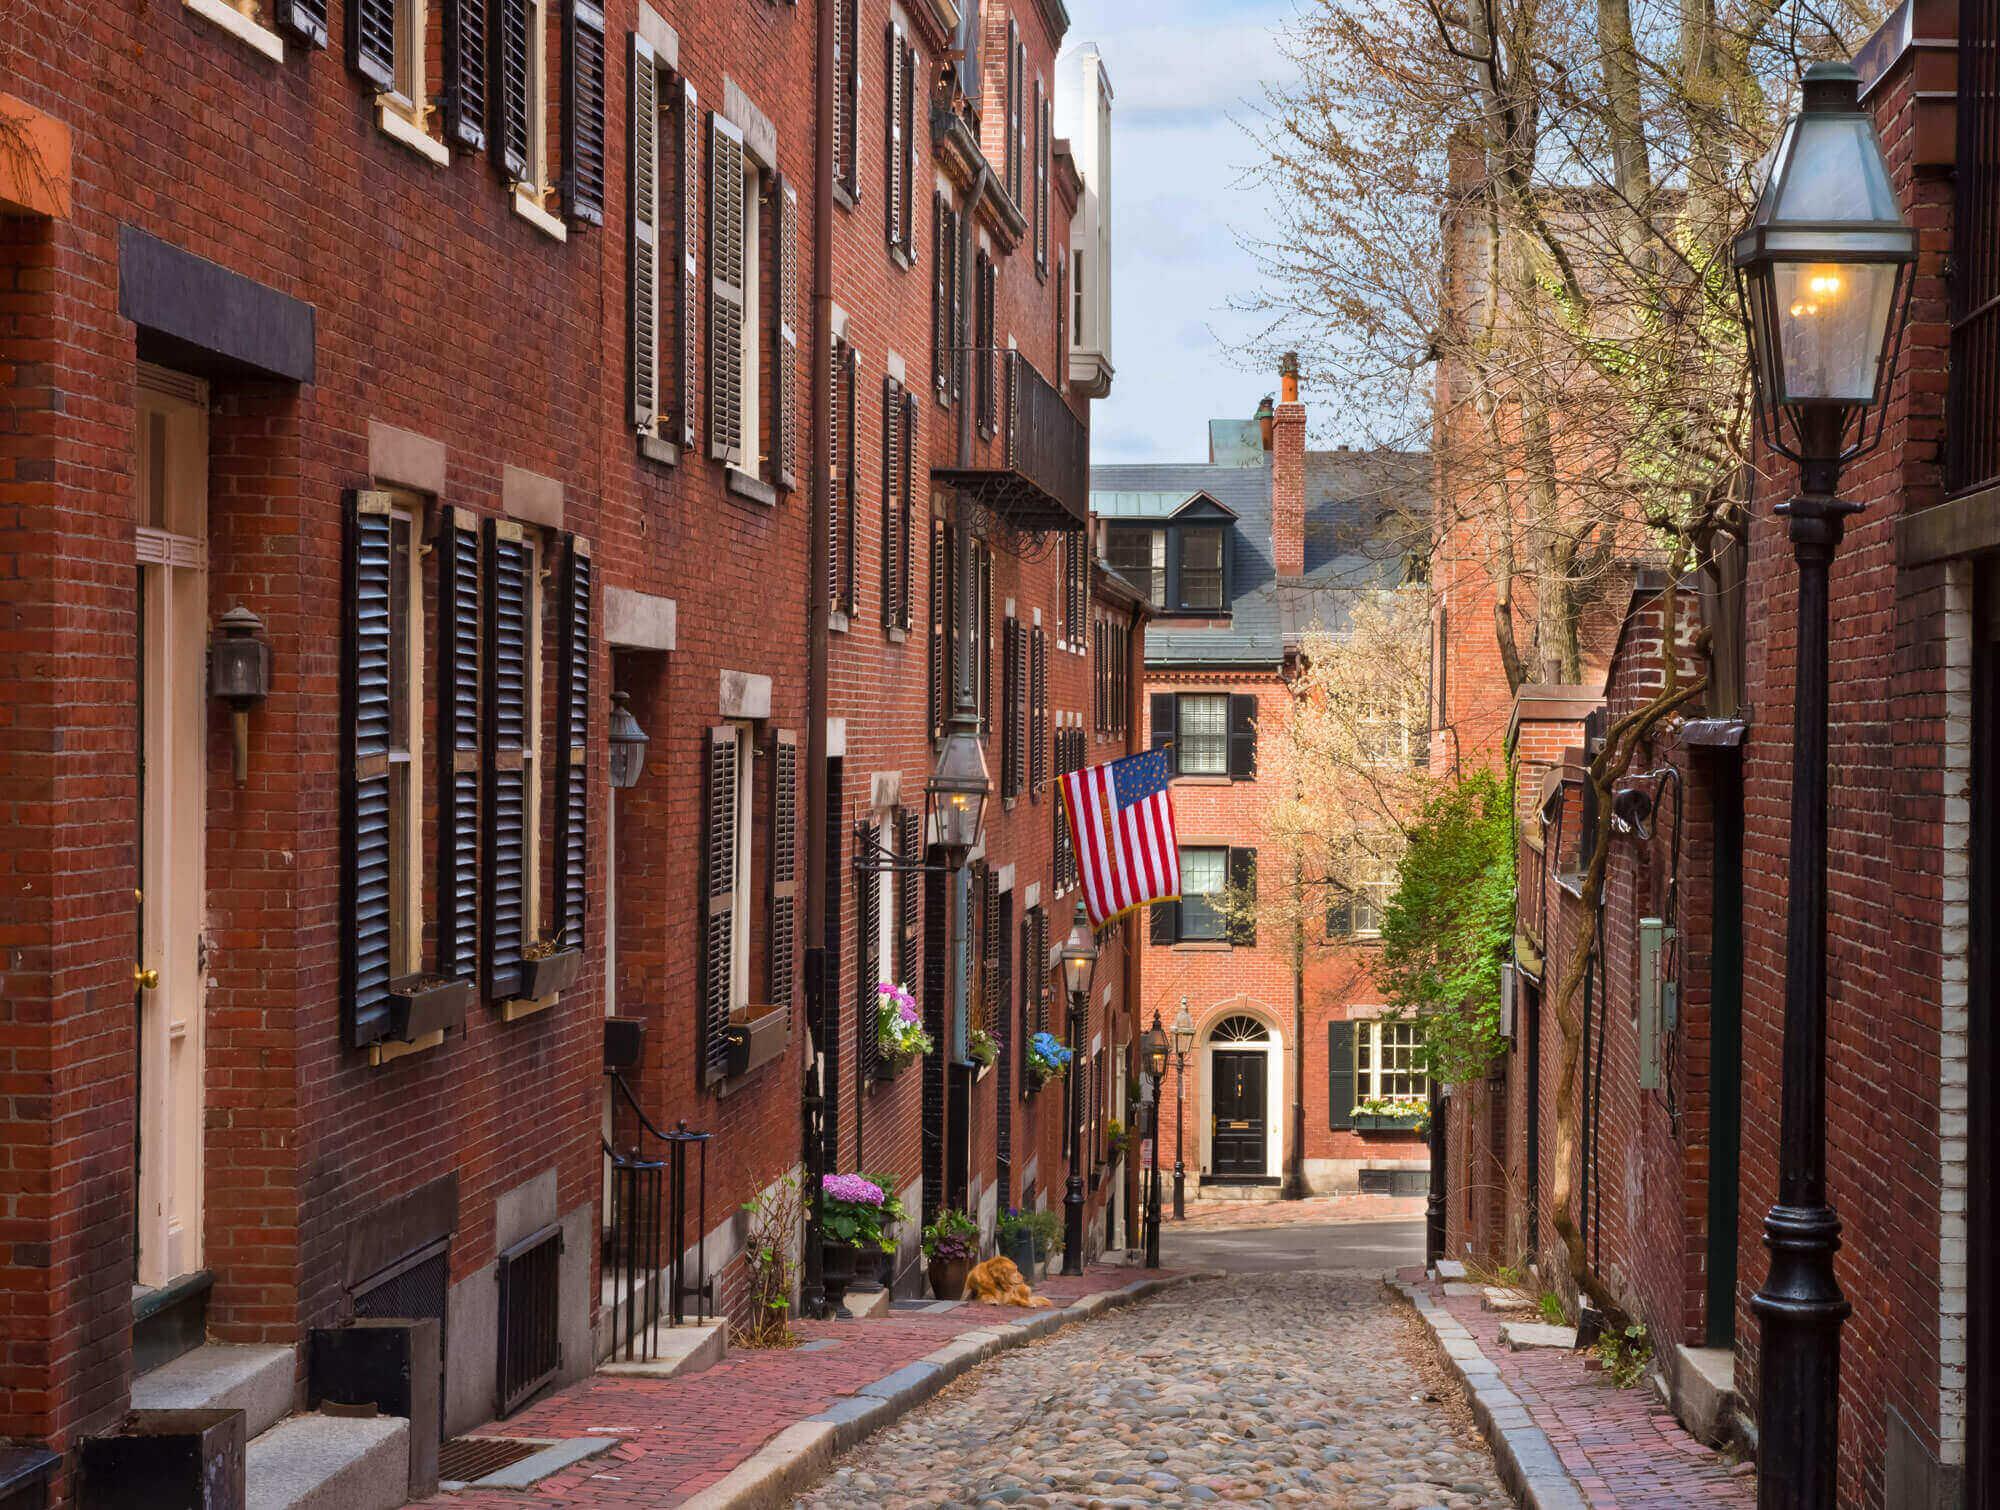 Looking downhill down narrow cobblestone acornt street in a residential neighborhood in Beacon Hill, Boston